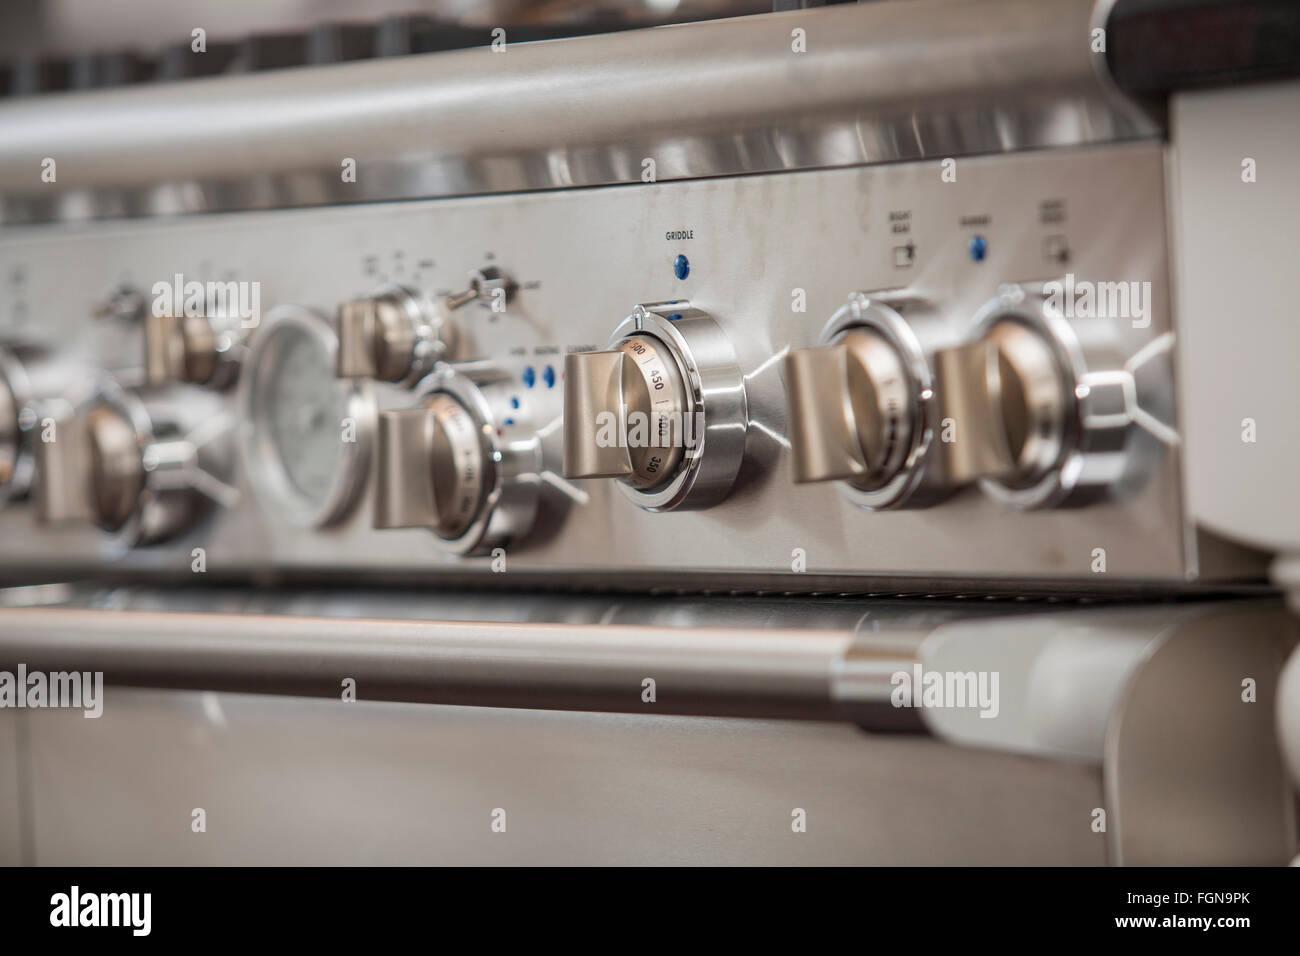 A high end kitchen range Stock Photo: 96355019 - Alamy